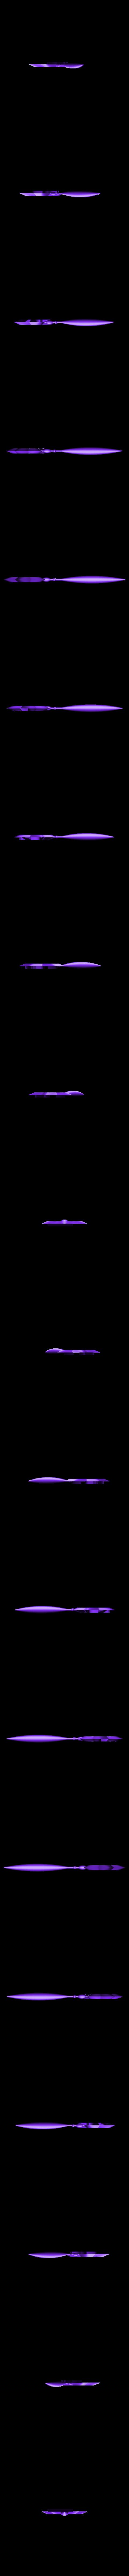 DAOKO One Piece.stl Télécharger fichier STL Baguette DAOKO Girl Star • Design à imprimer en 3D, httpkoopa